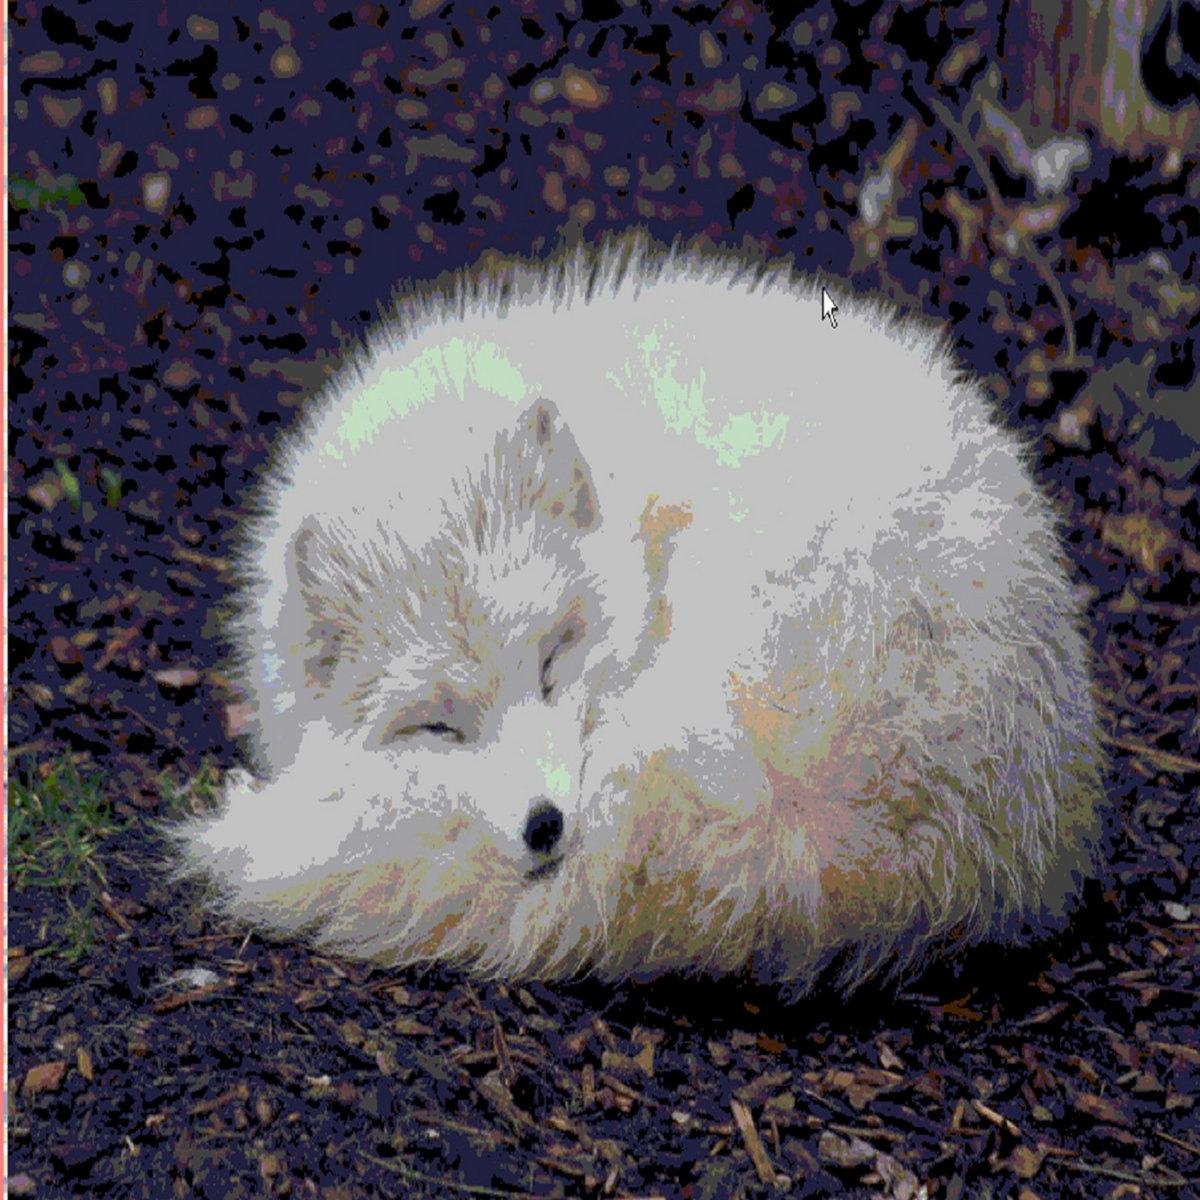 Artic Fox cover